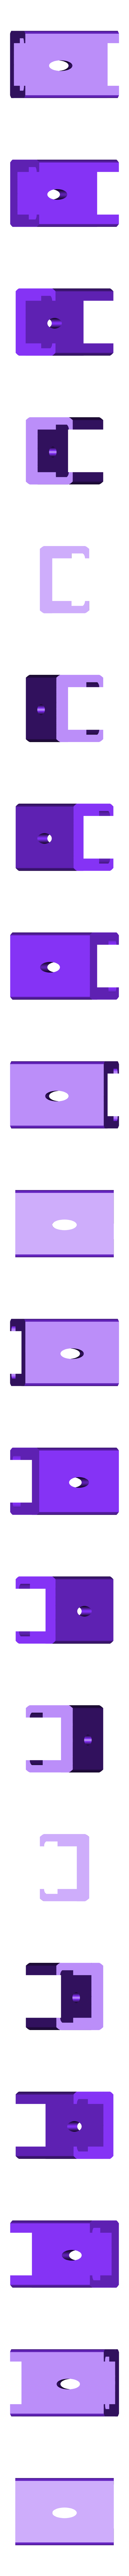 iphonesnoozealarmdock_fixed.stl Download free STL file iPhone Alarm Dock • 3D printable template, Ilourray